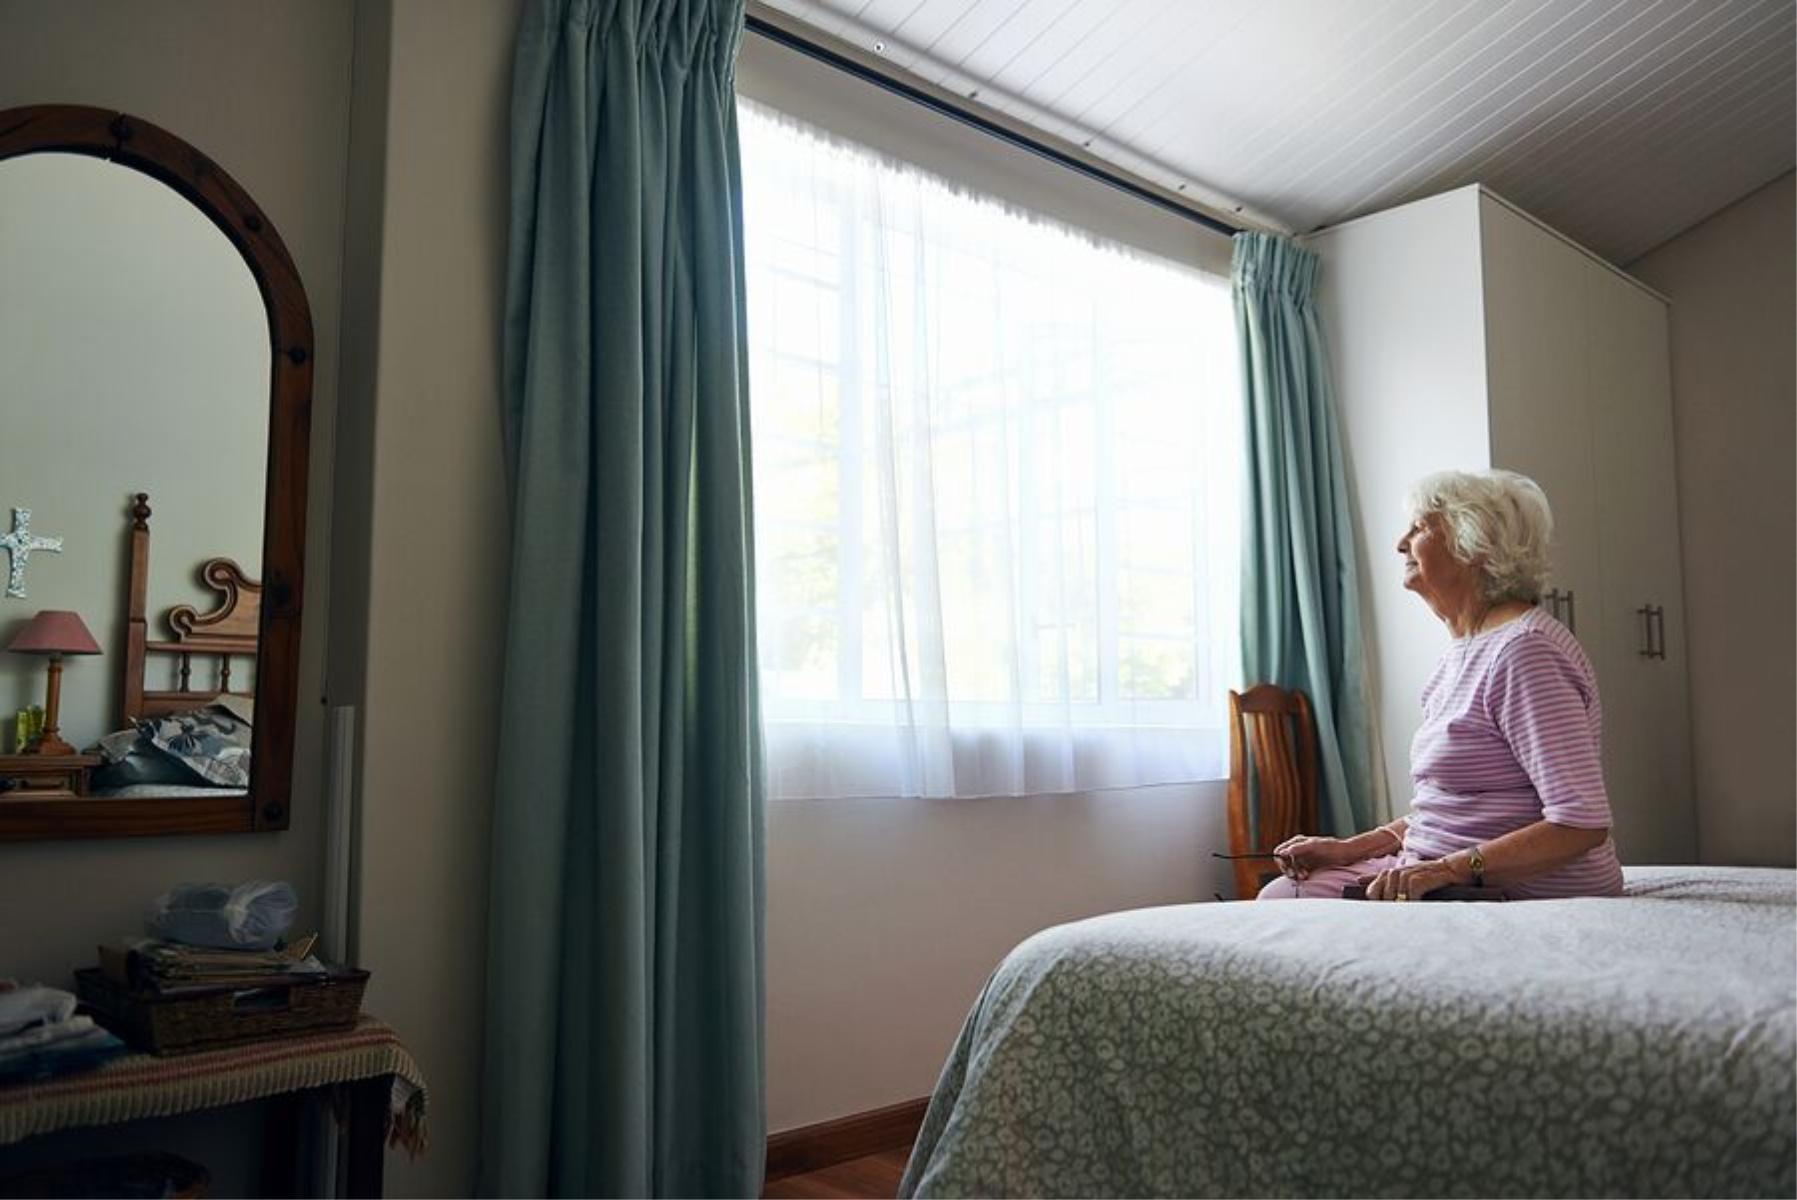 Senior Care in Elizabeth PA: Fight the Winter Blues